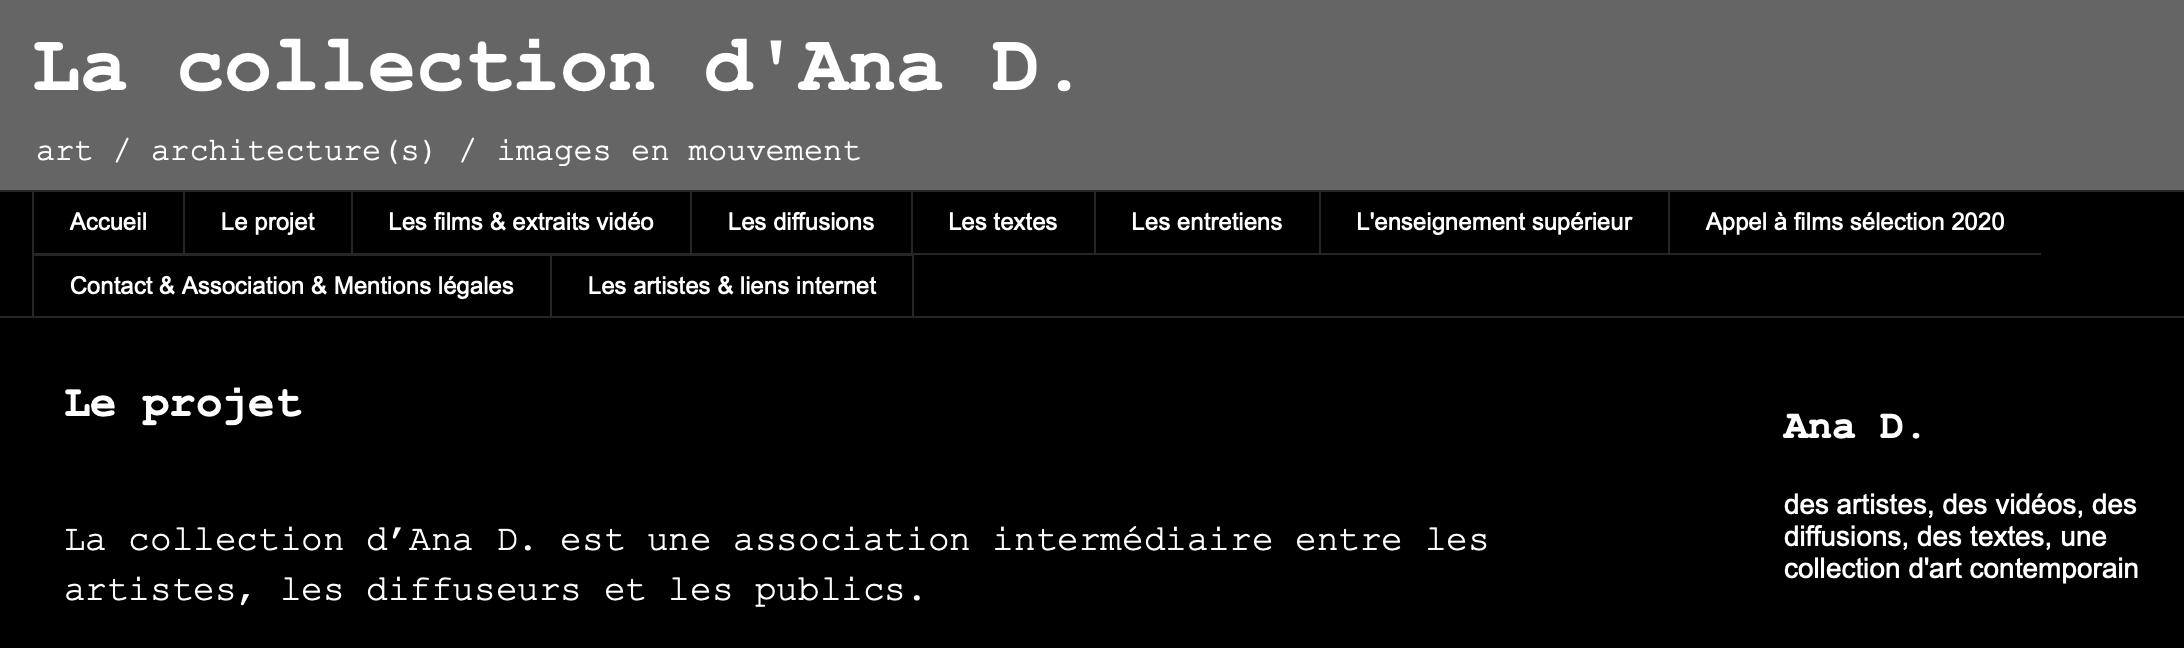 Ana D